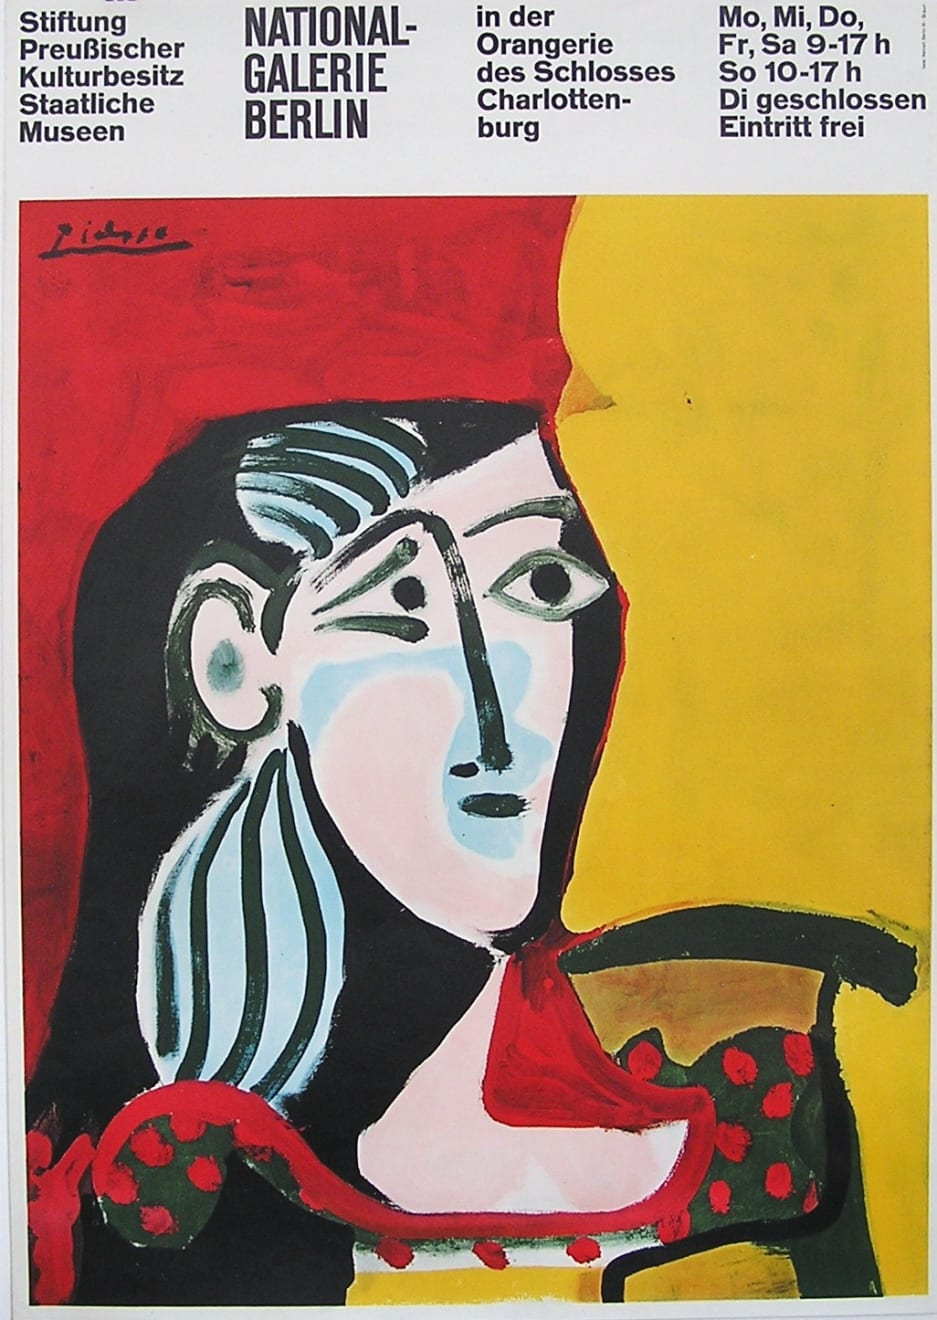 Pablo Picasso, Picasso Nationalgalerie Berlin Poster, 1960s